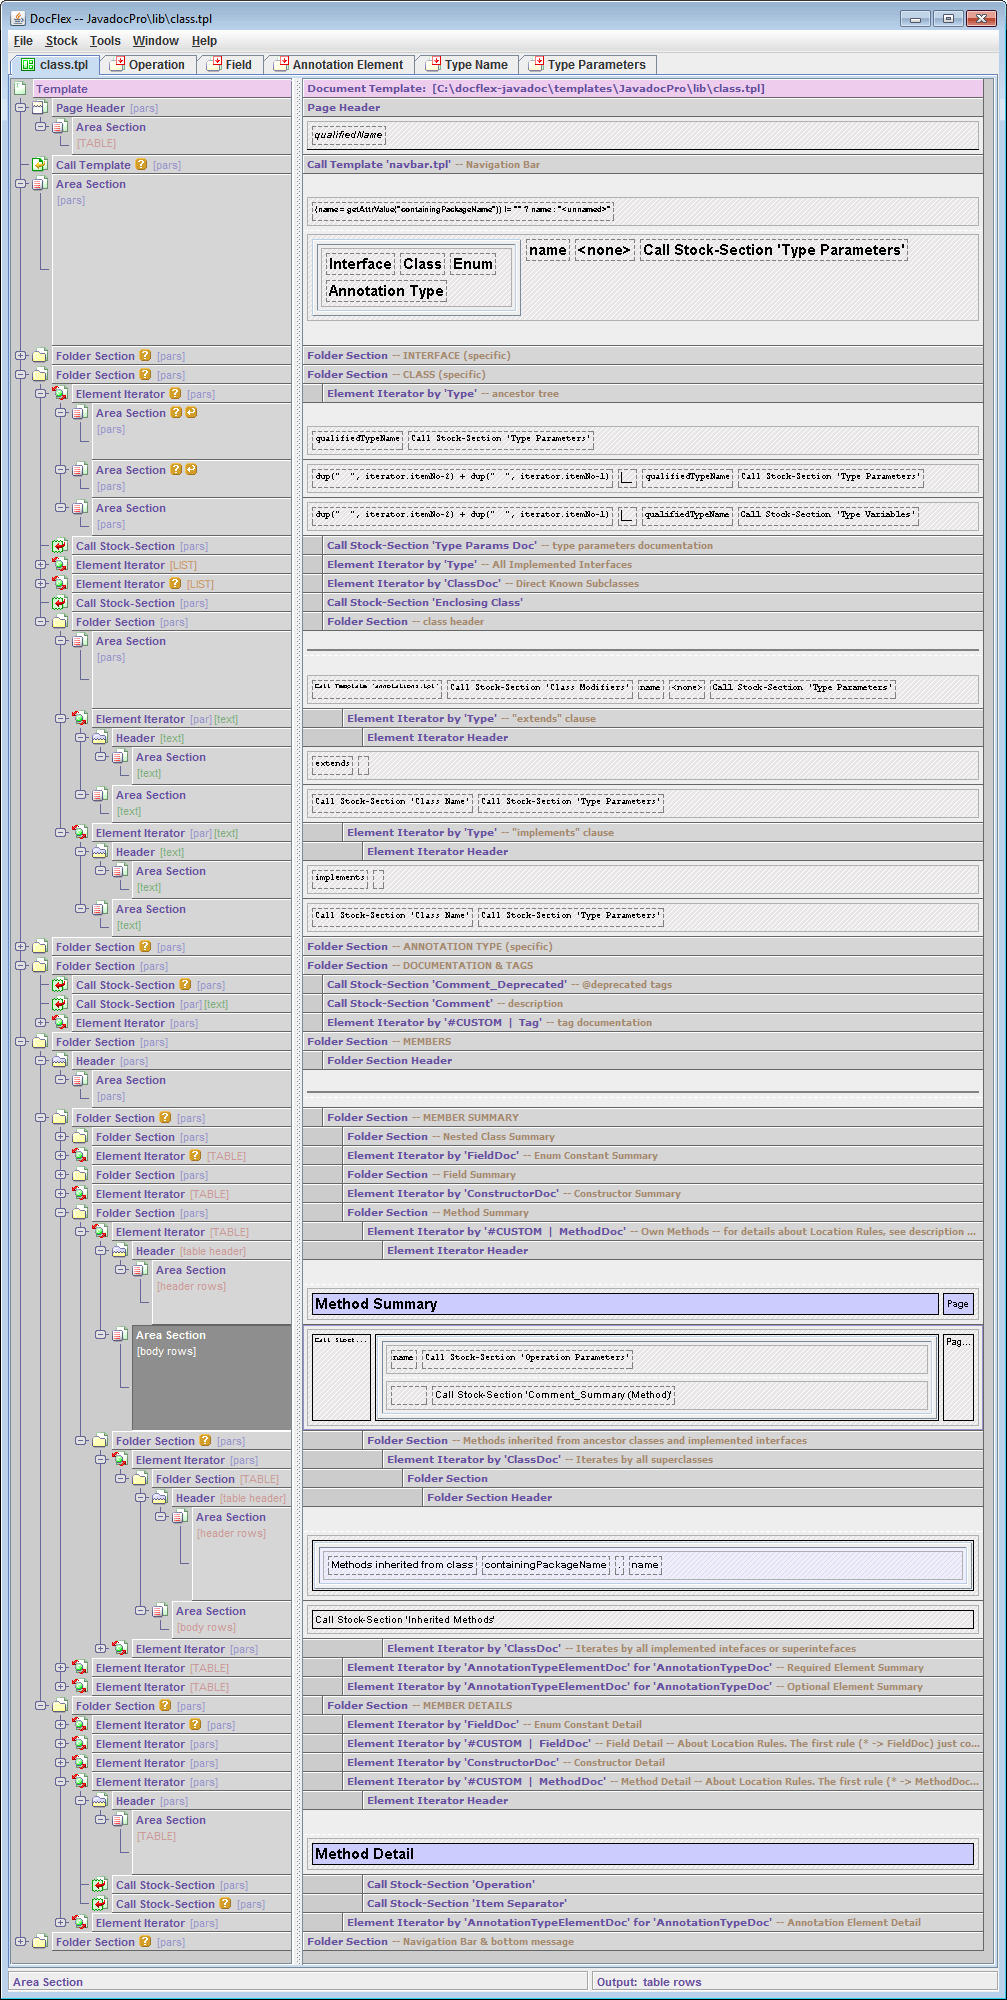 DocFlex/Javadoc 1.6.0: Multi-Format Doclet & Doclet Development Tool ...